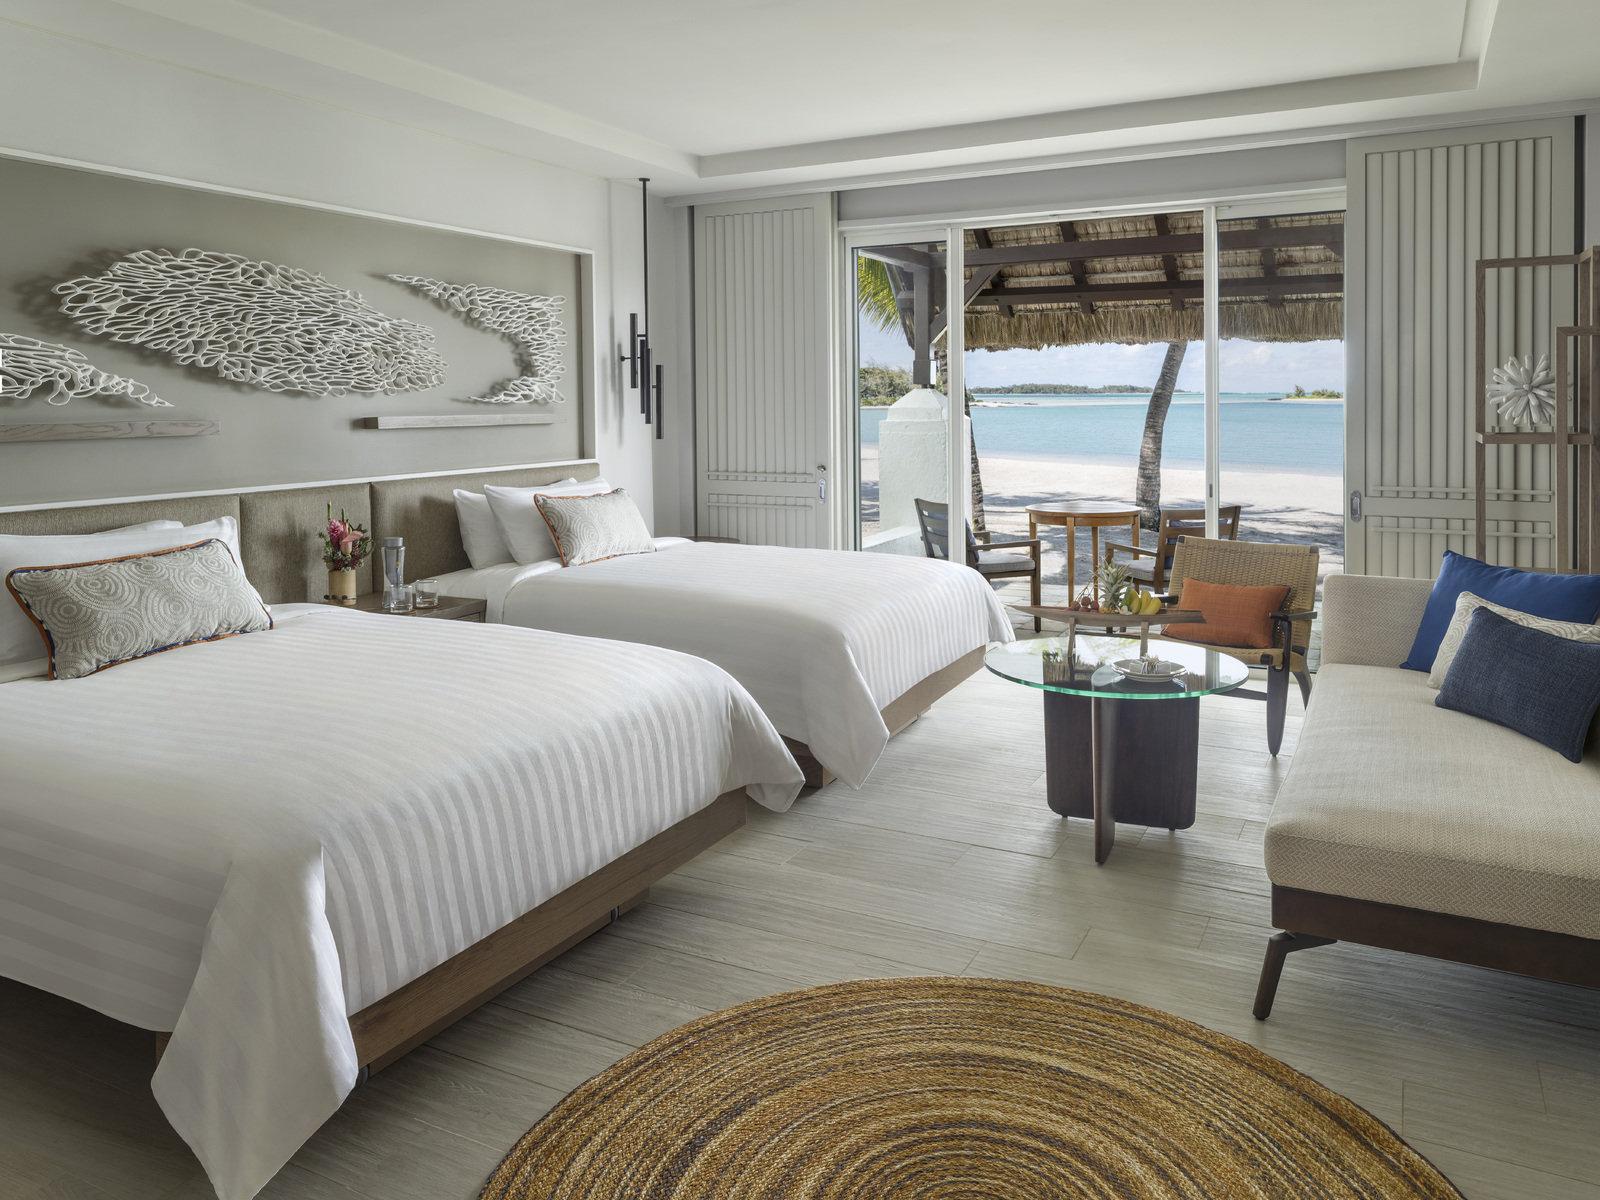 Wohnbeispiel Honeymoon Deluxe Beach Access